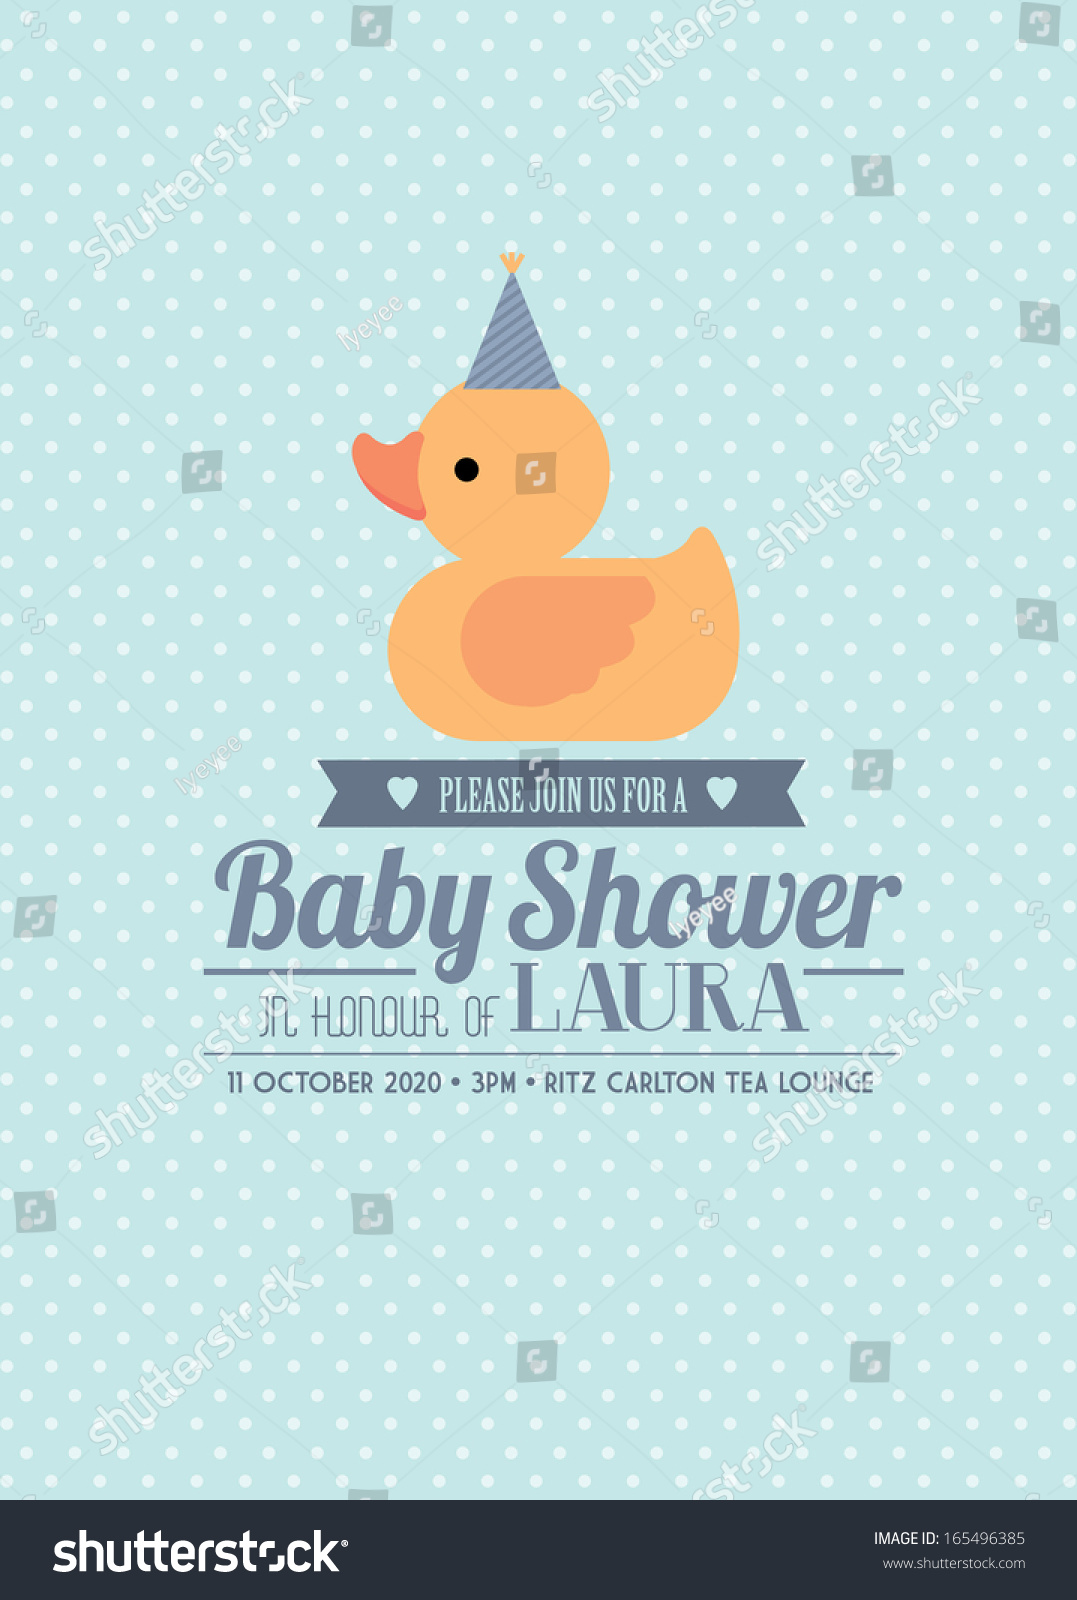 Rubber Ducky Baby Shower Invitation Card Template Boy Vector/Illustration - 165496385 : Shutterstock